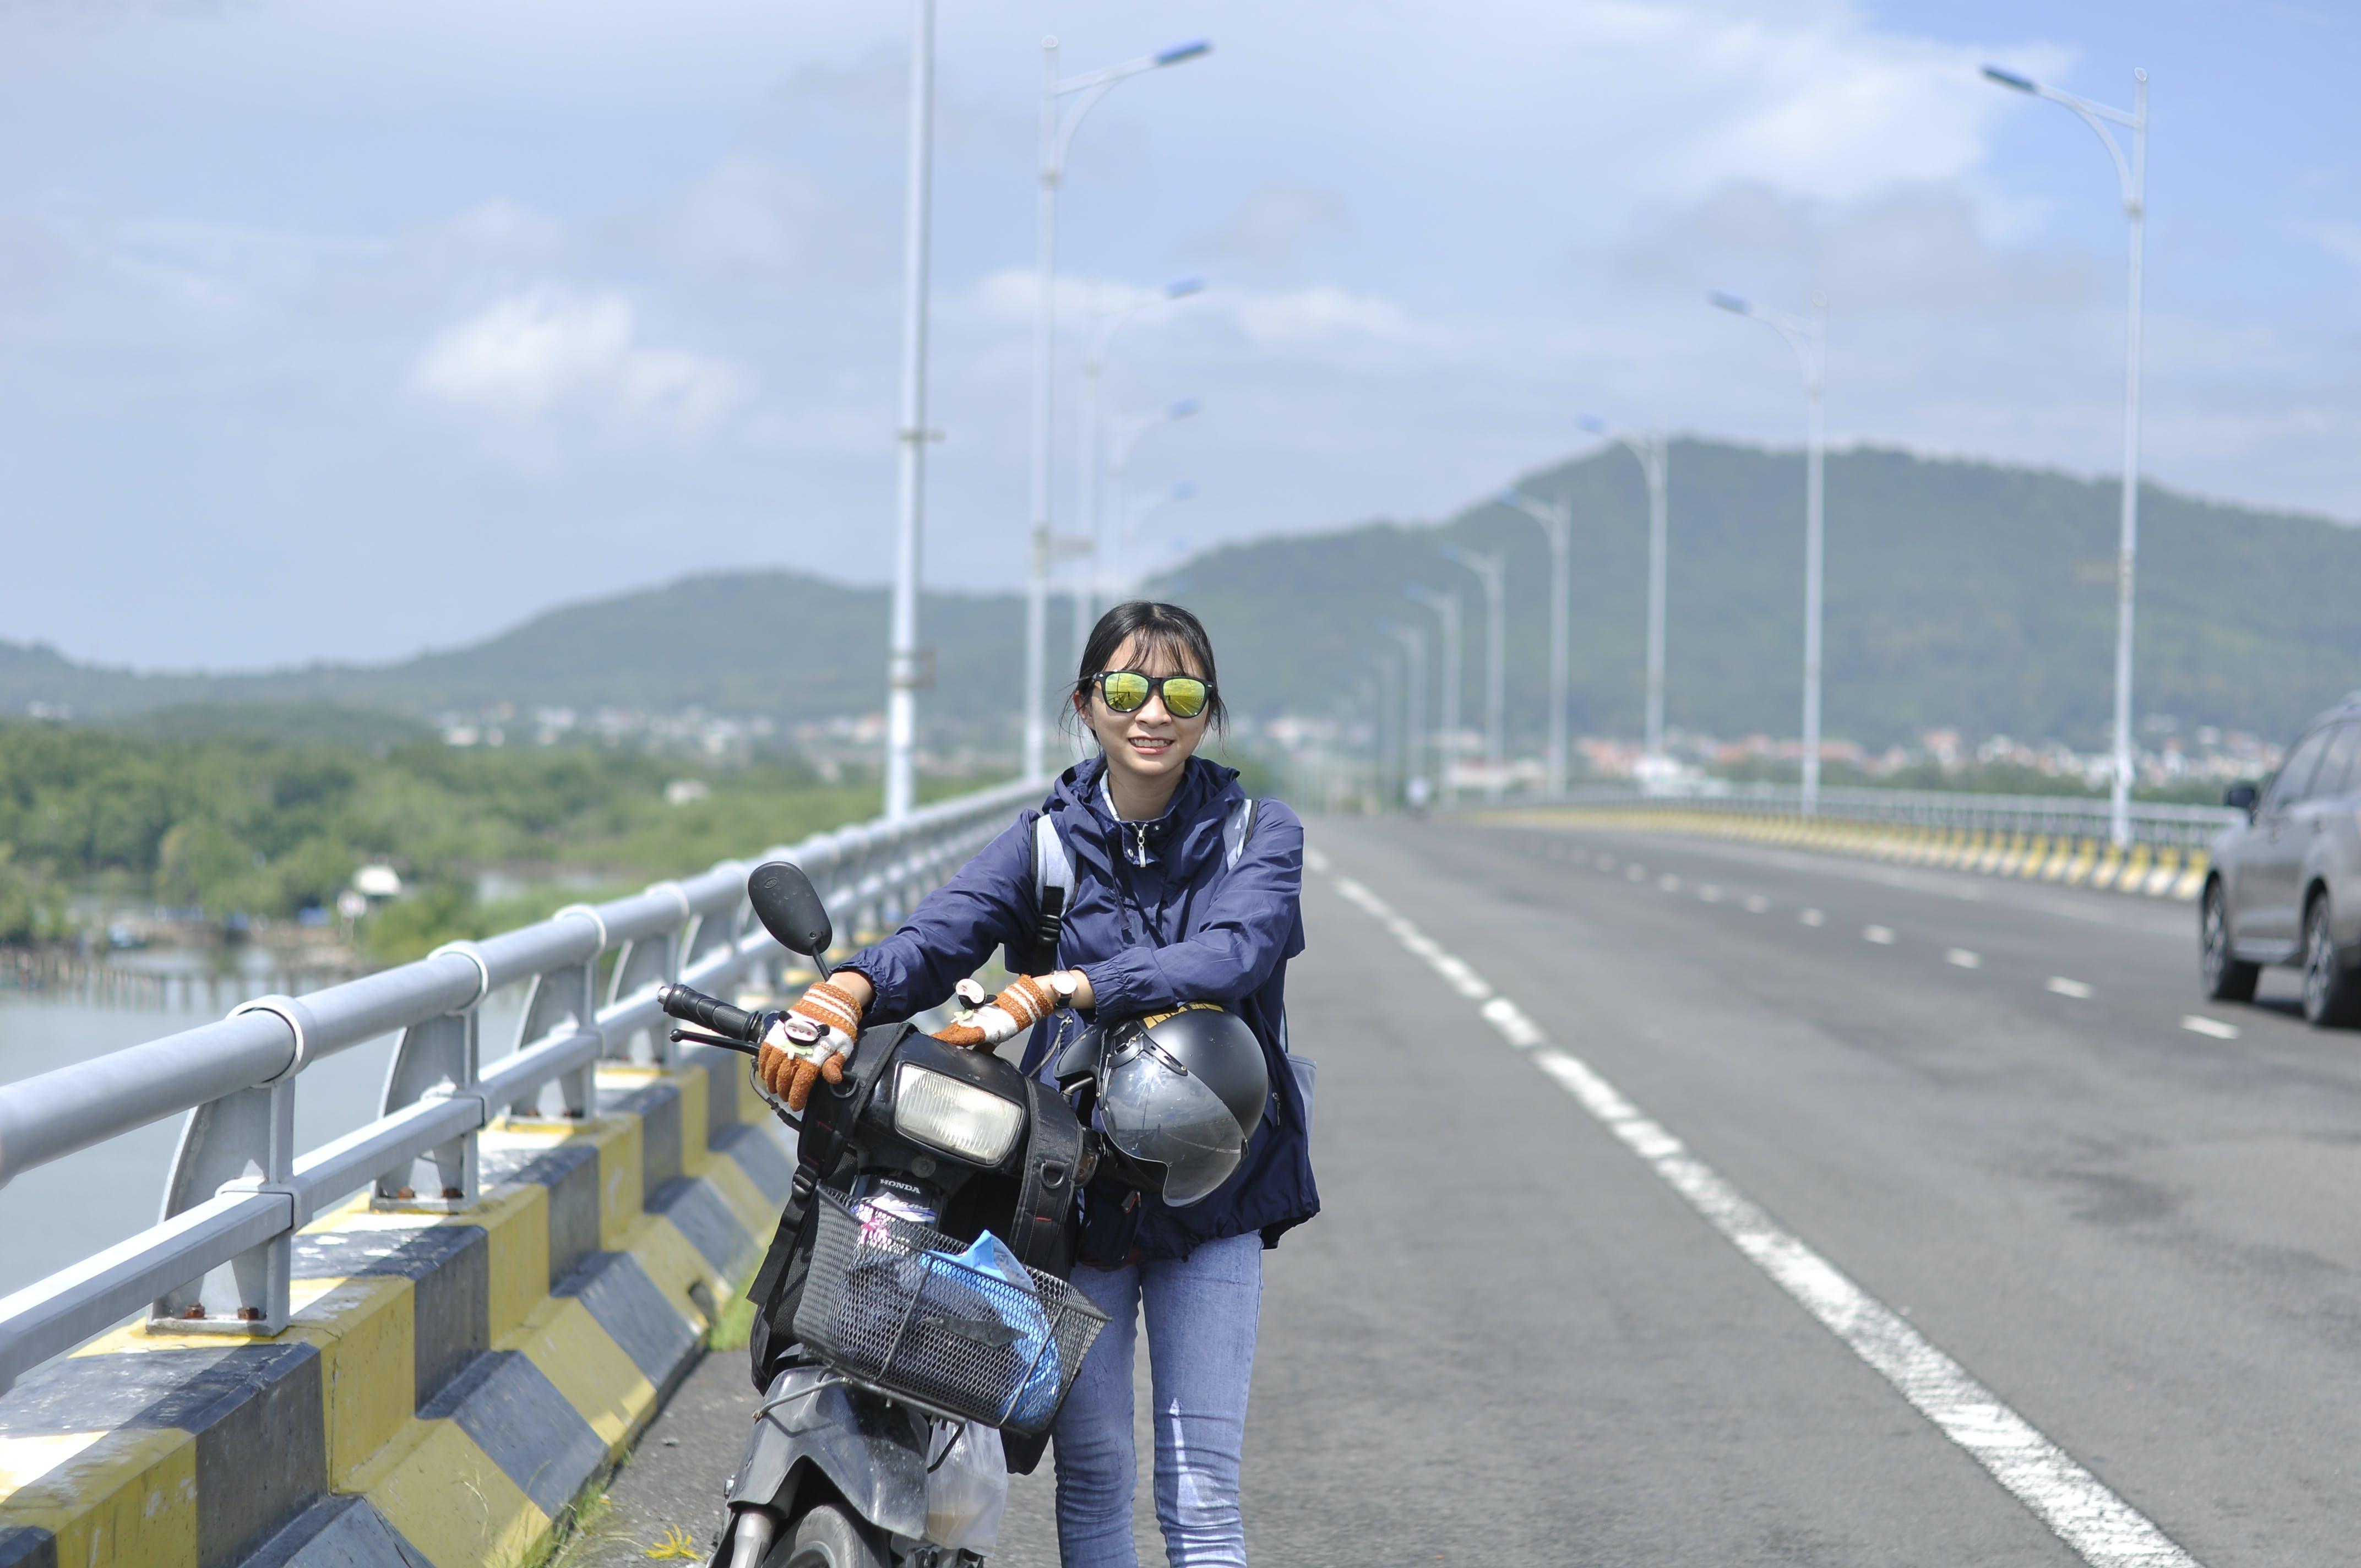 Free stock photo of asian girl, bdrige, motor bike, path